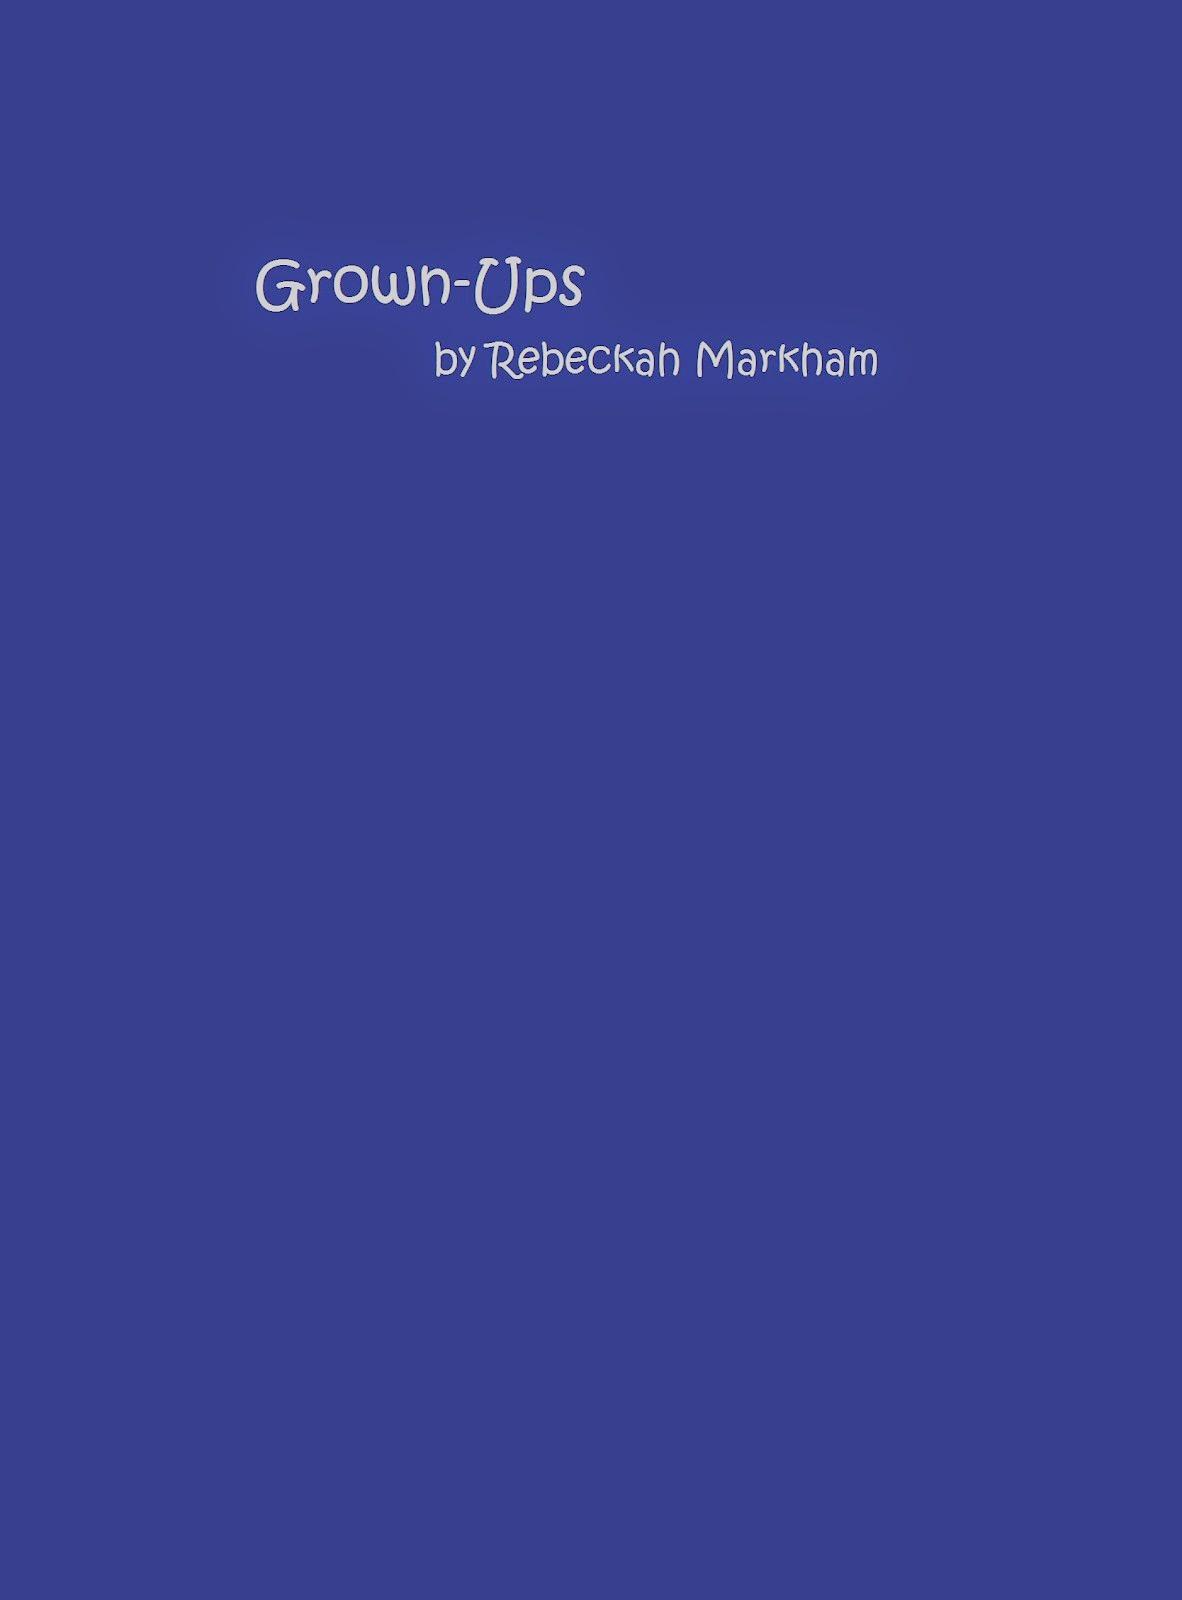 Grownups